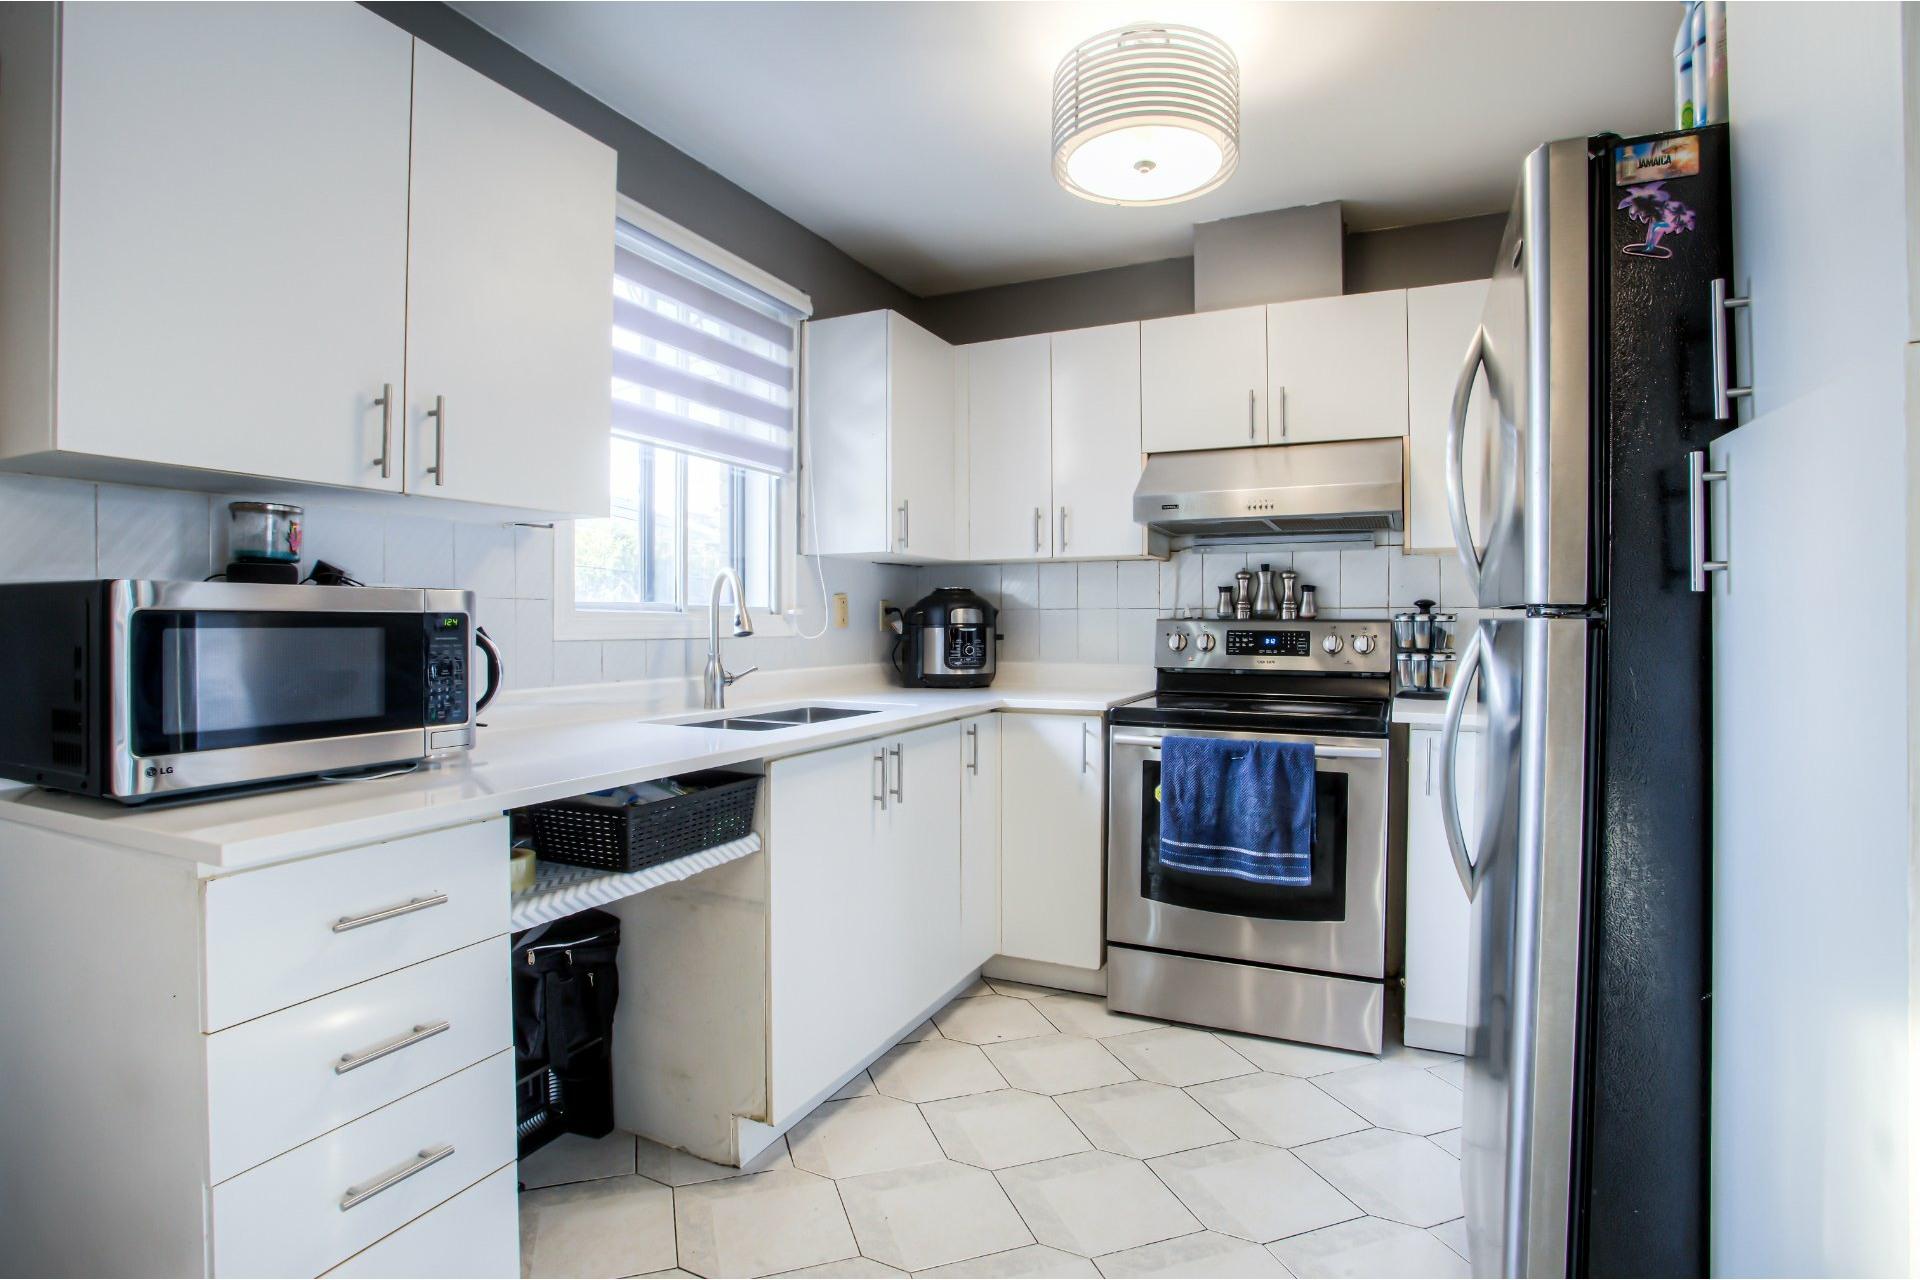 image 9 - House For sale Pierrefonds-Roxboro Montréal  - 8 rooms